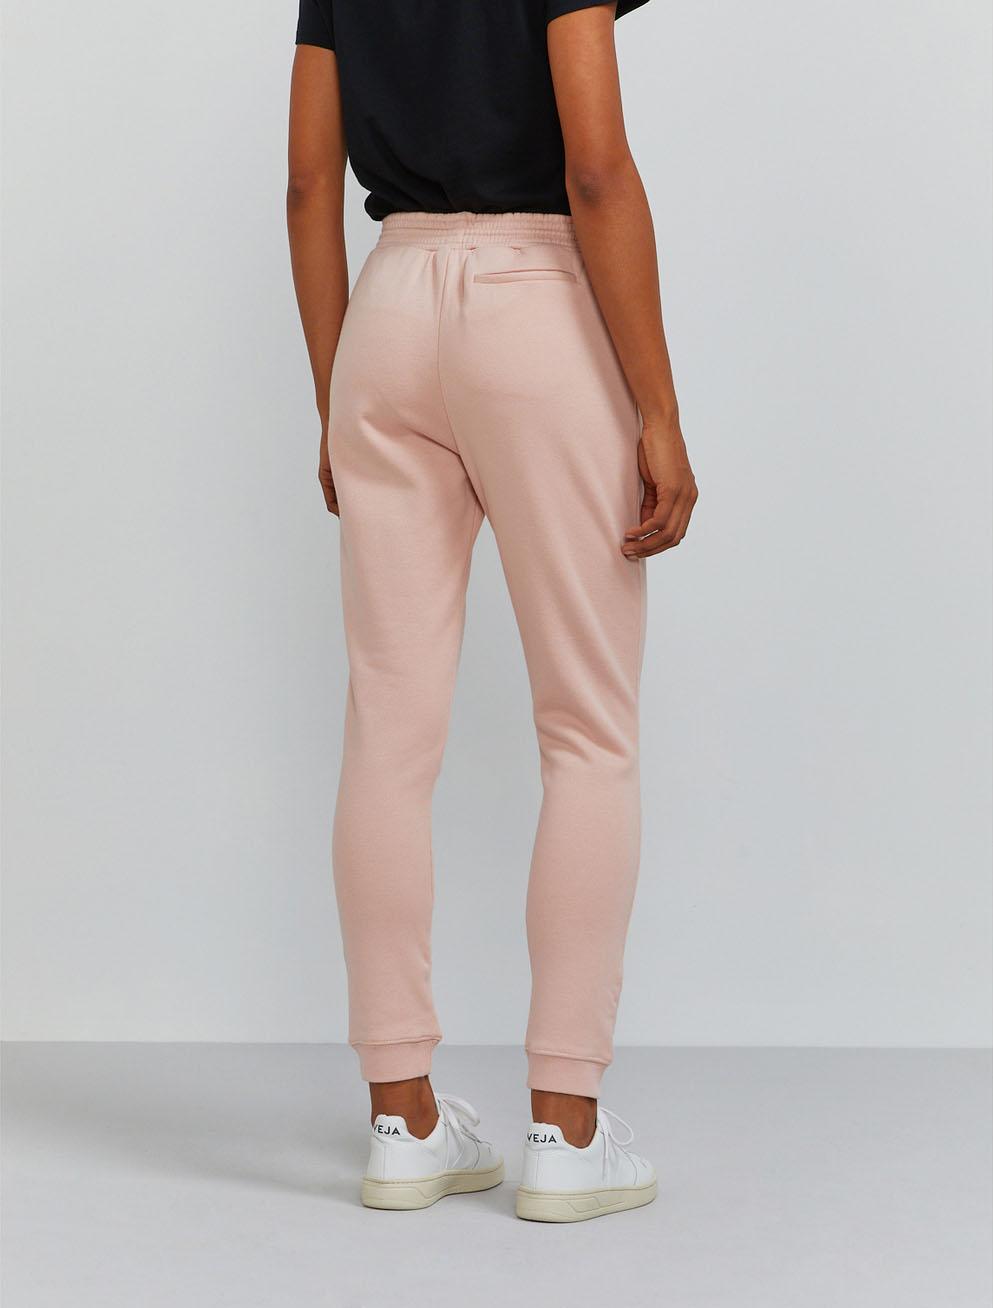 Slim leg sweatpants